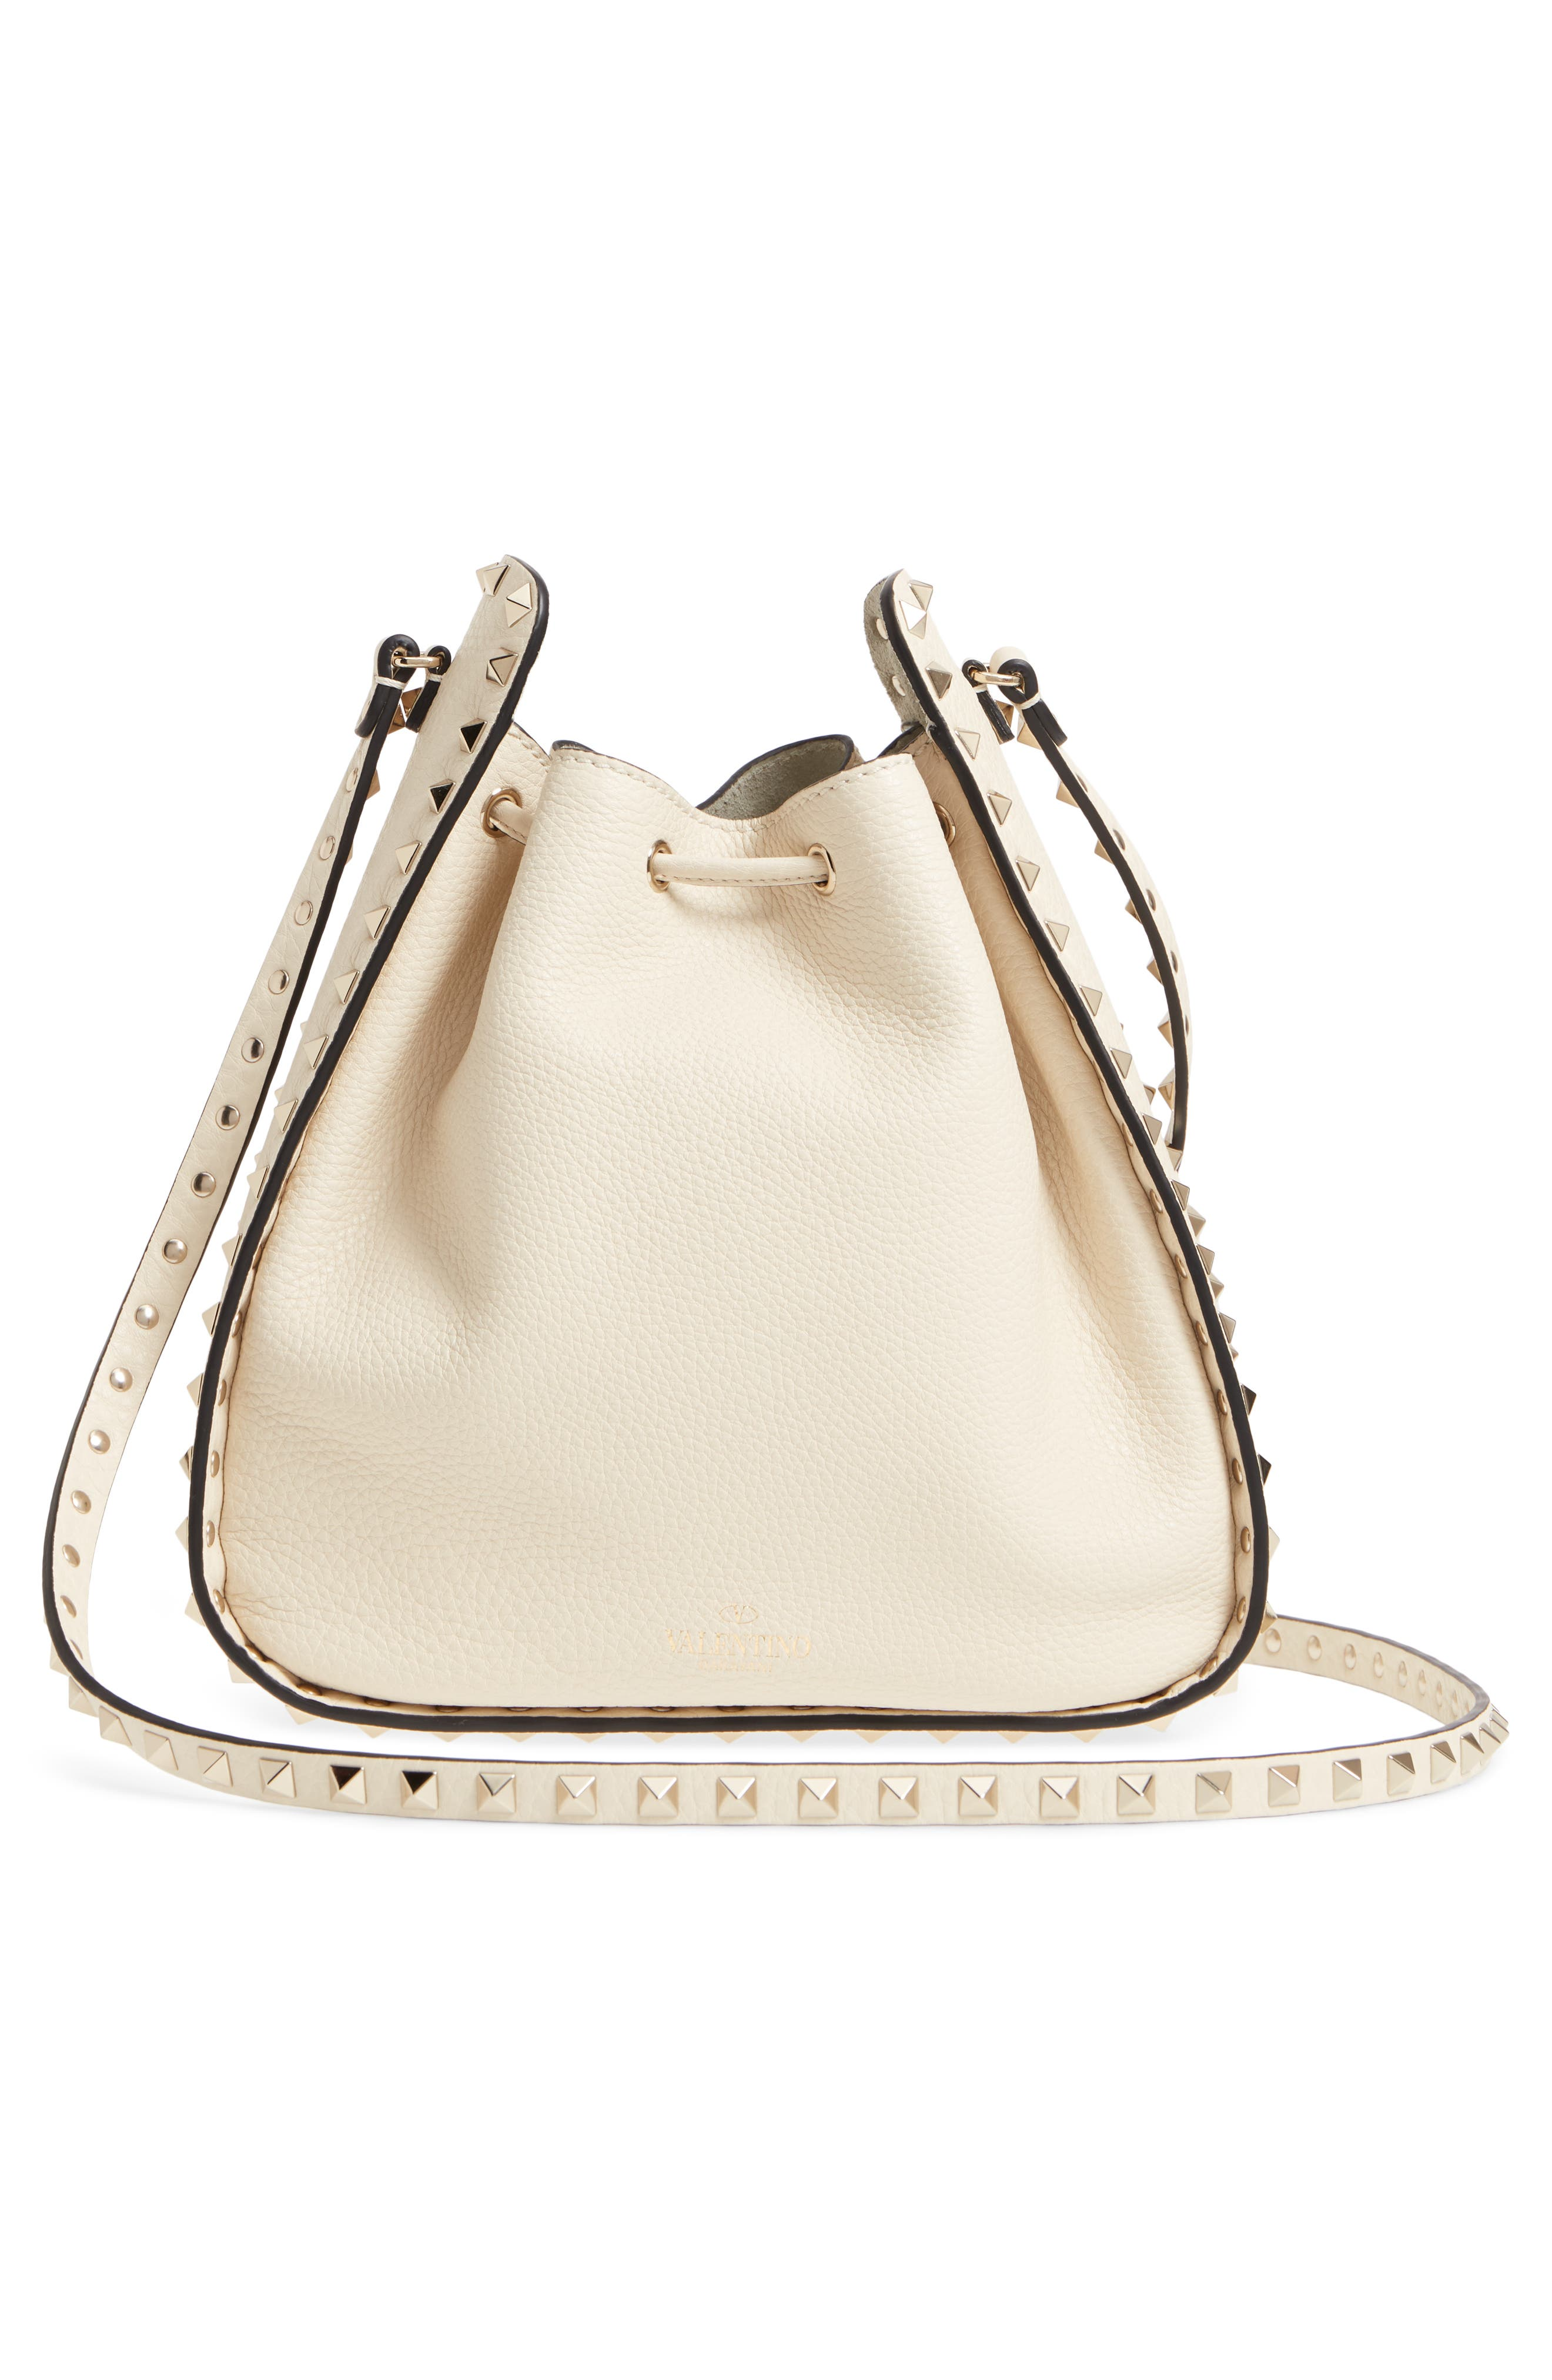 Large Rockstud Leather Bucket Bag,                             Alternate thumbnail 3, color,                             Ivory/ Gold